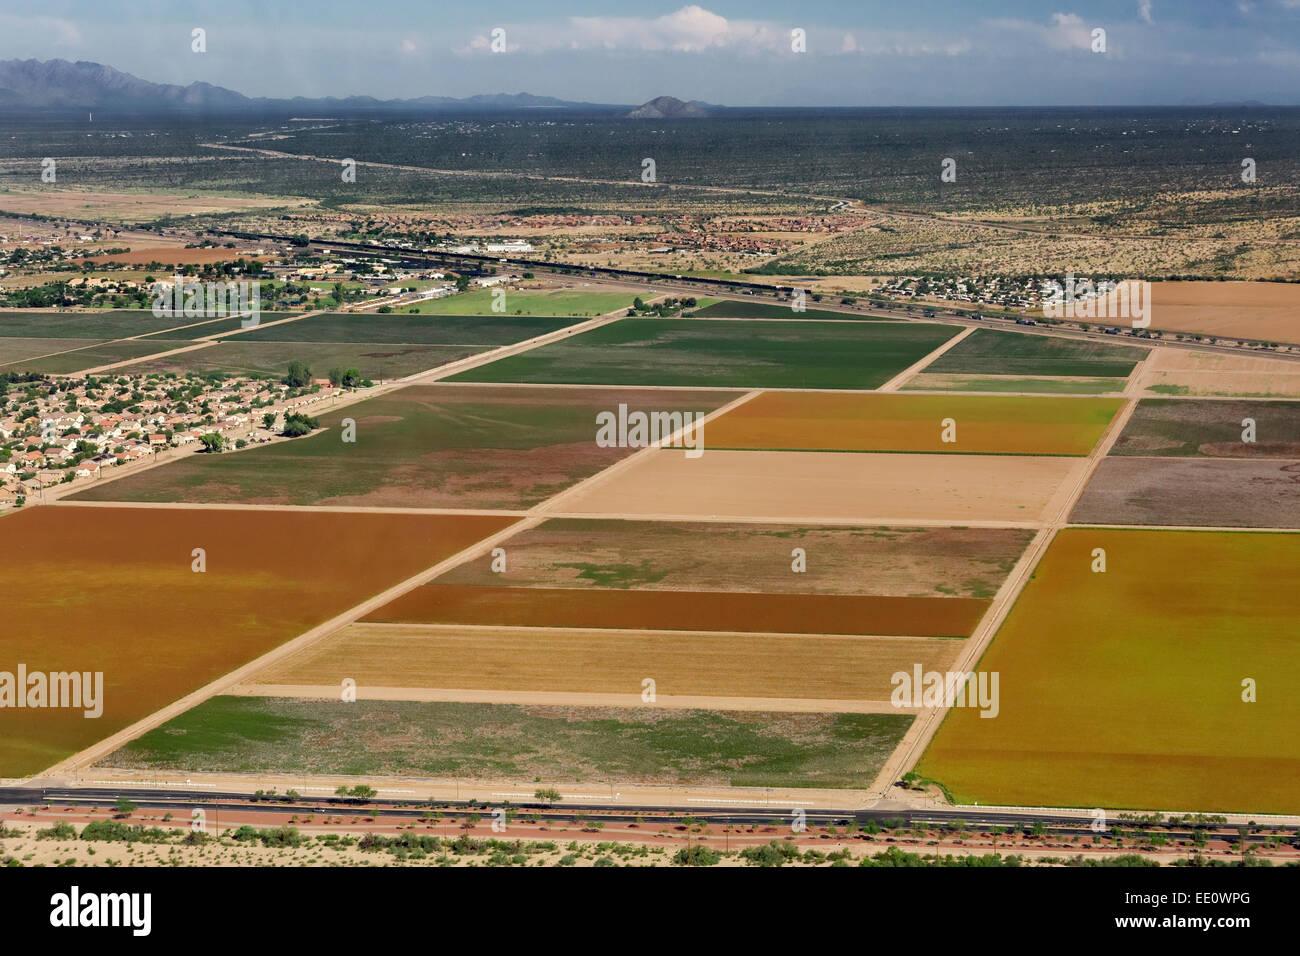 Agriculture Aerial, Marana, Arizona - Stock Image